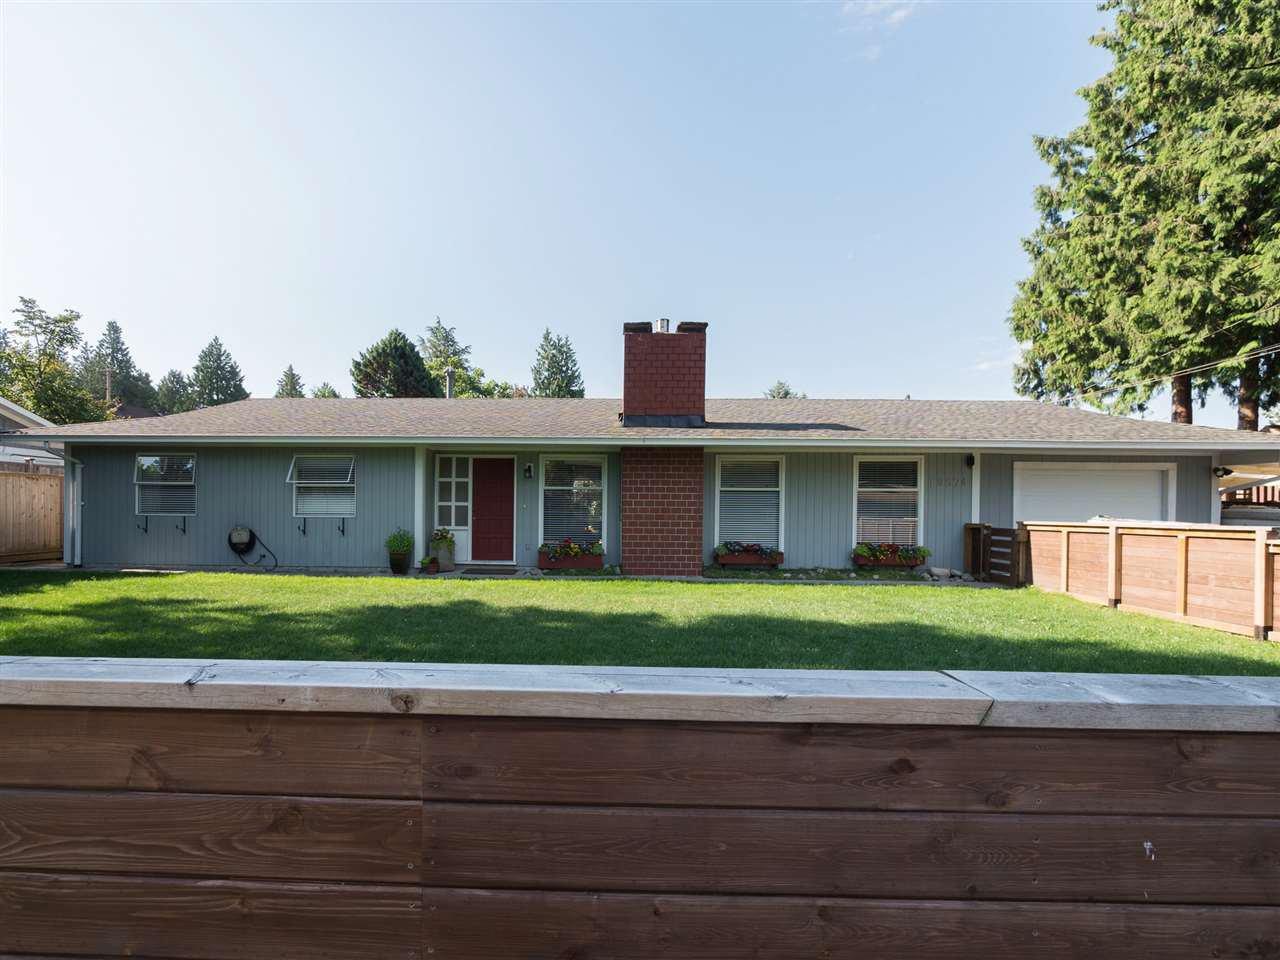 Main Photo: 19574 117B Avenue in Pitt Meadows: South Meadows House for sale : MLS®# R2281991